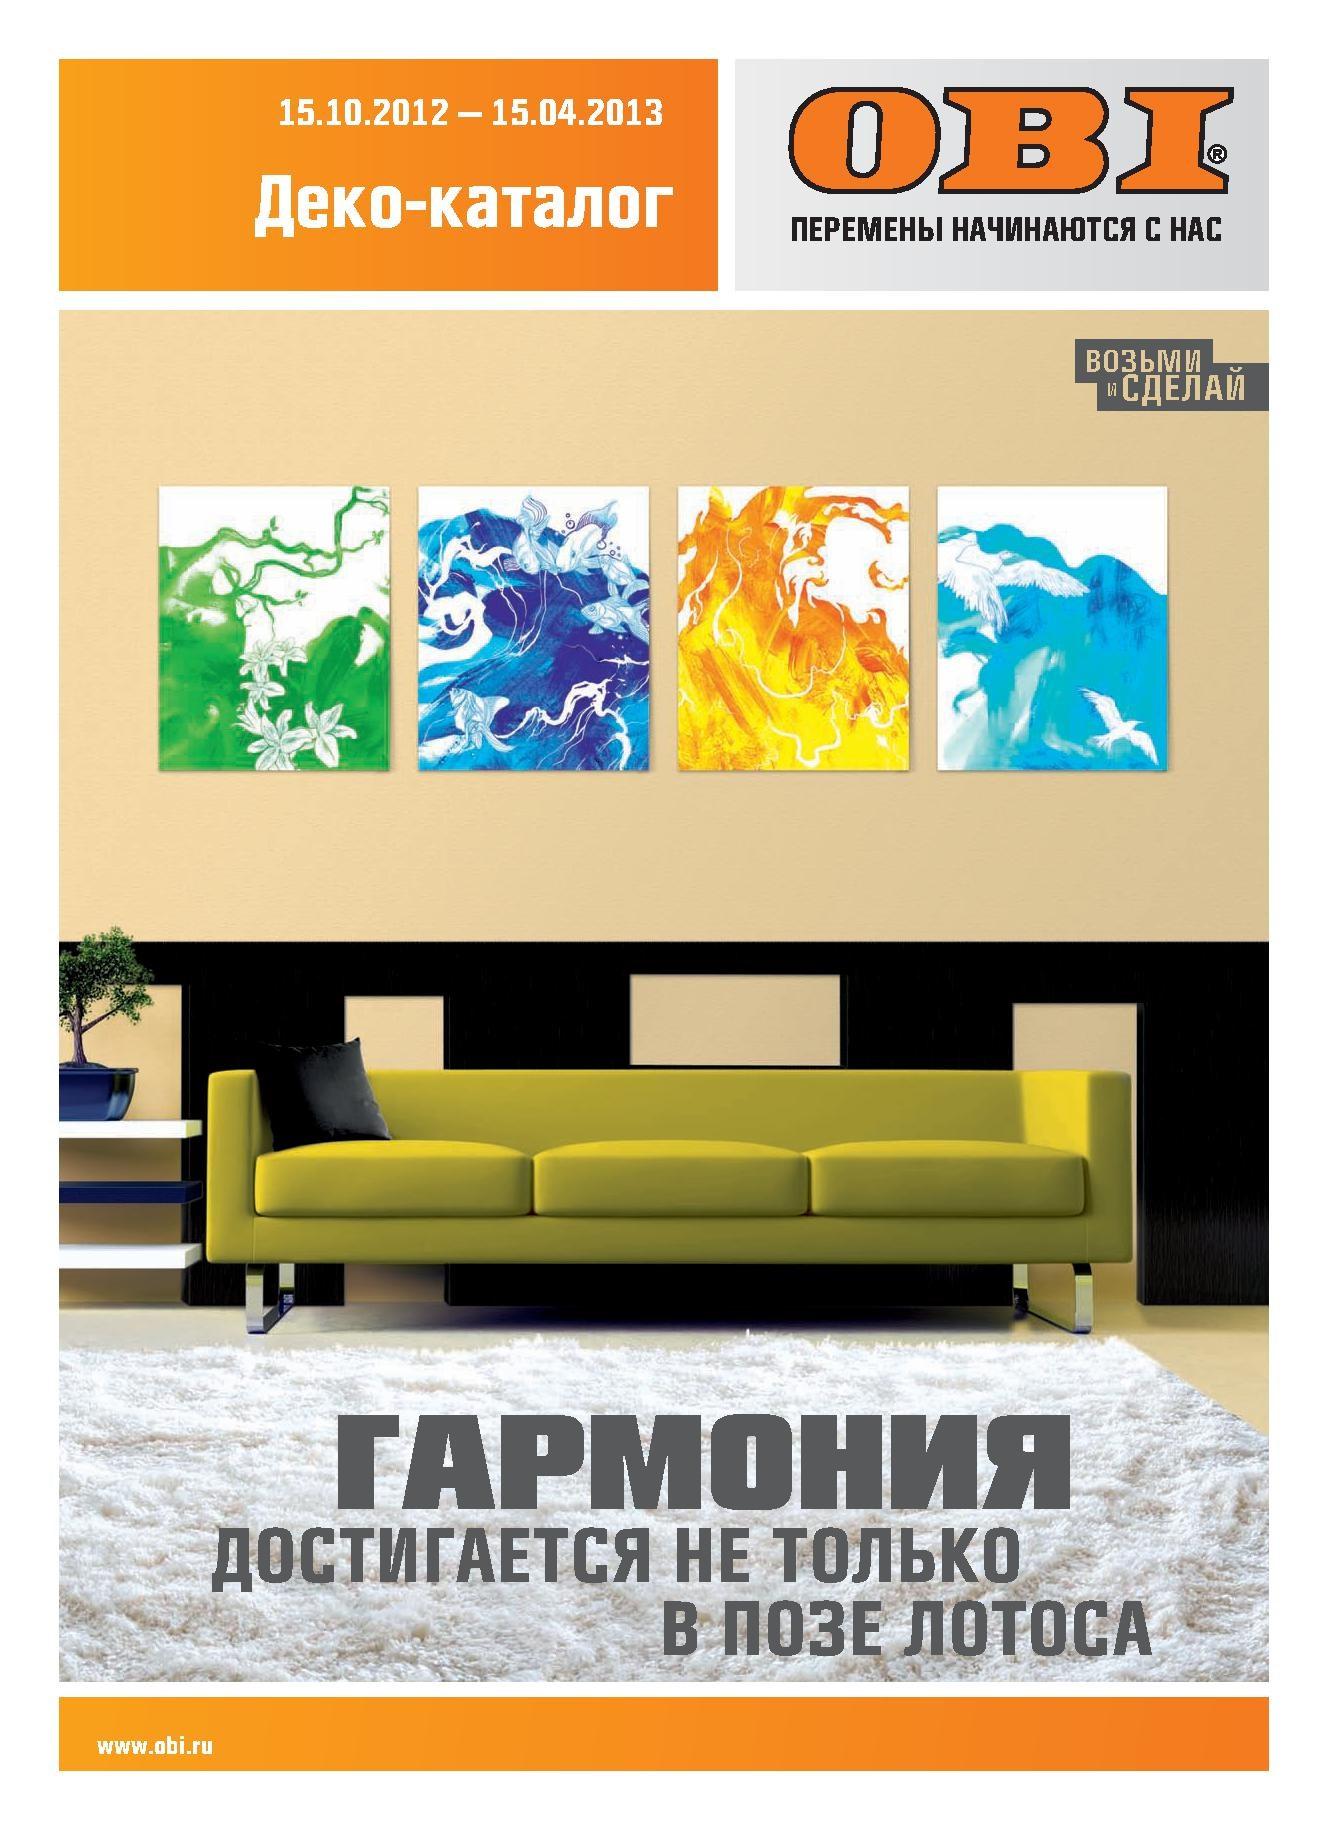 Оби Омск Интернет Магазин